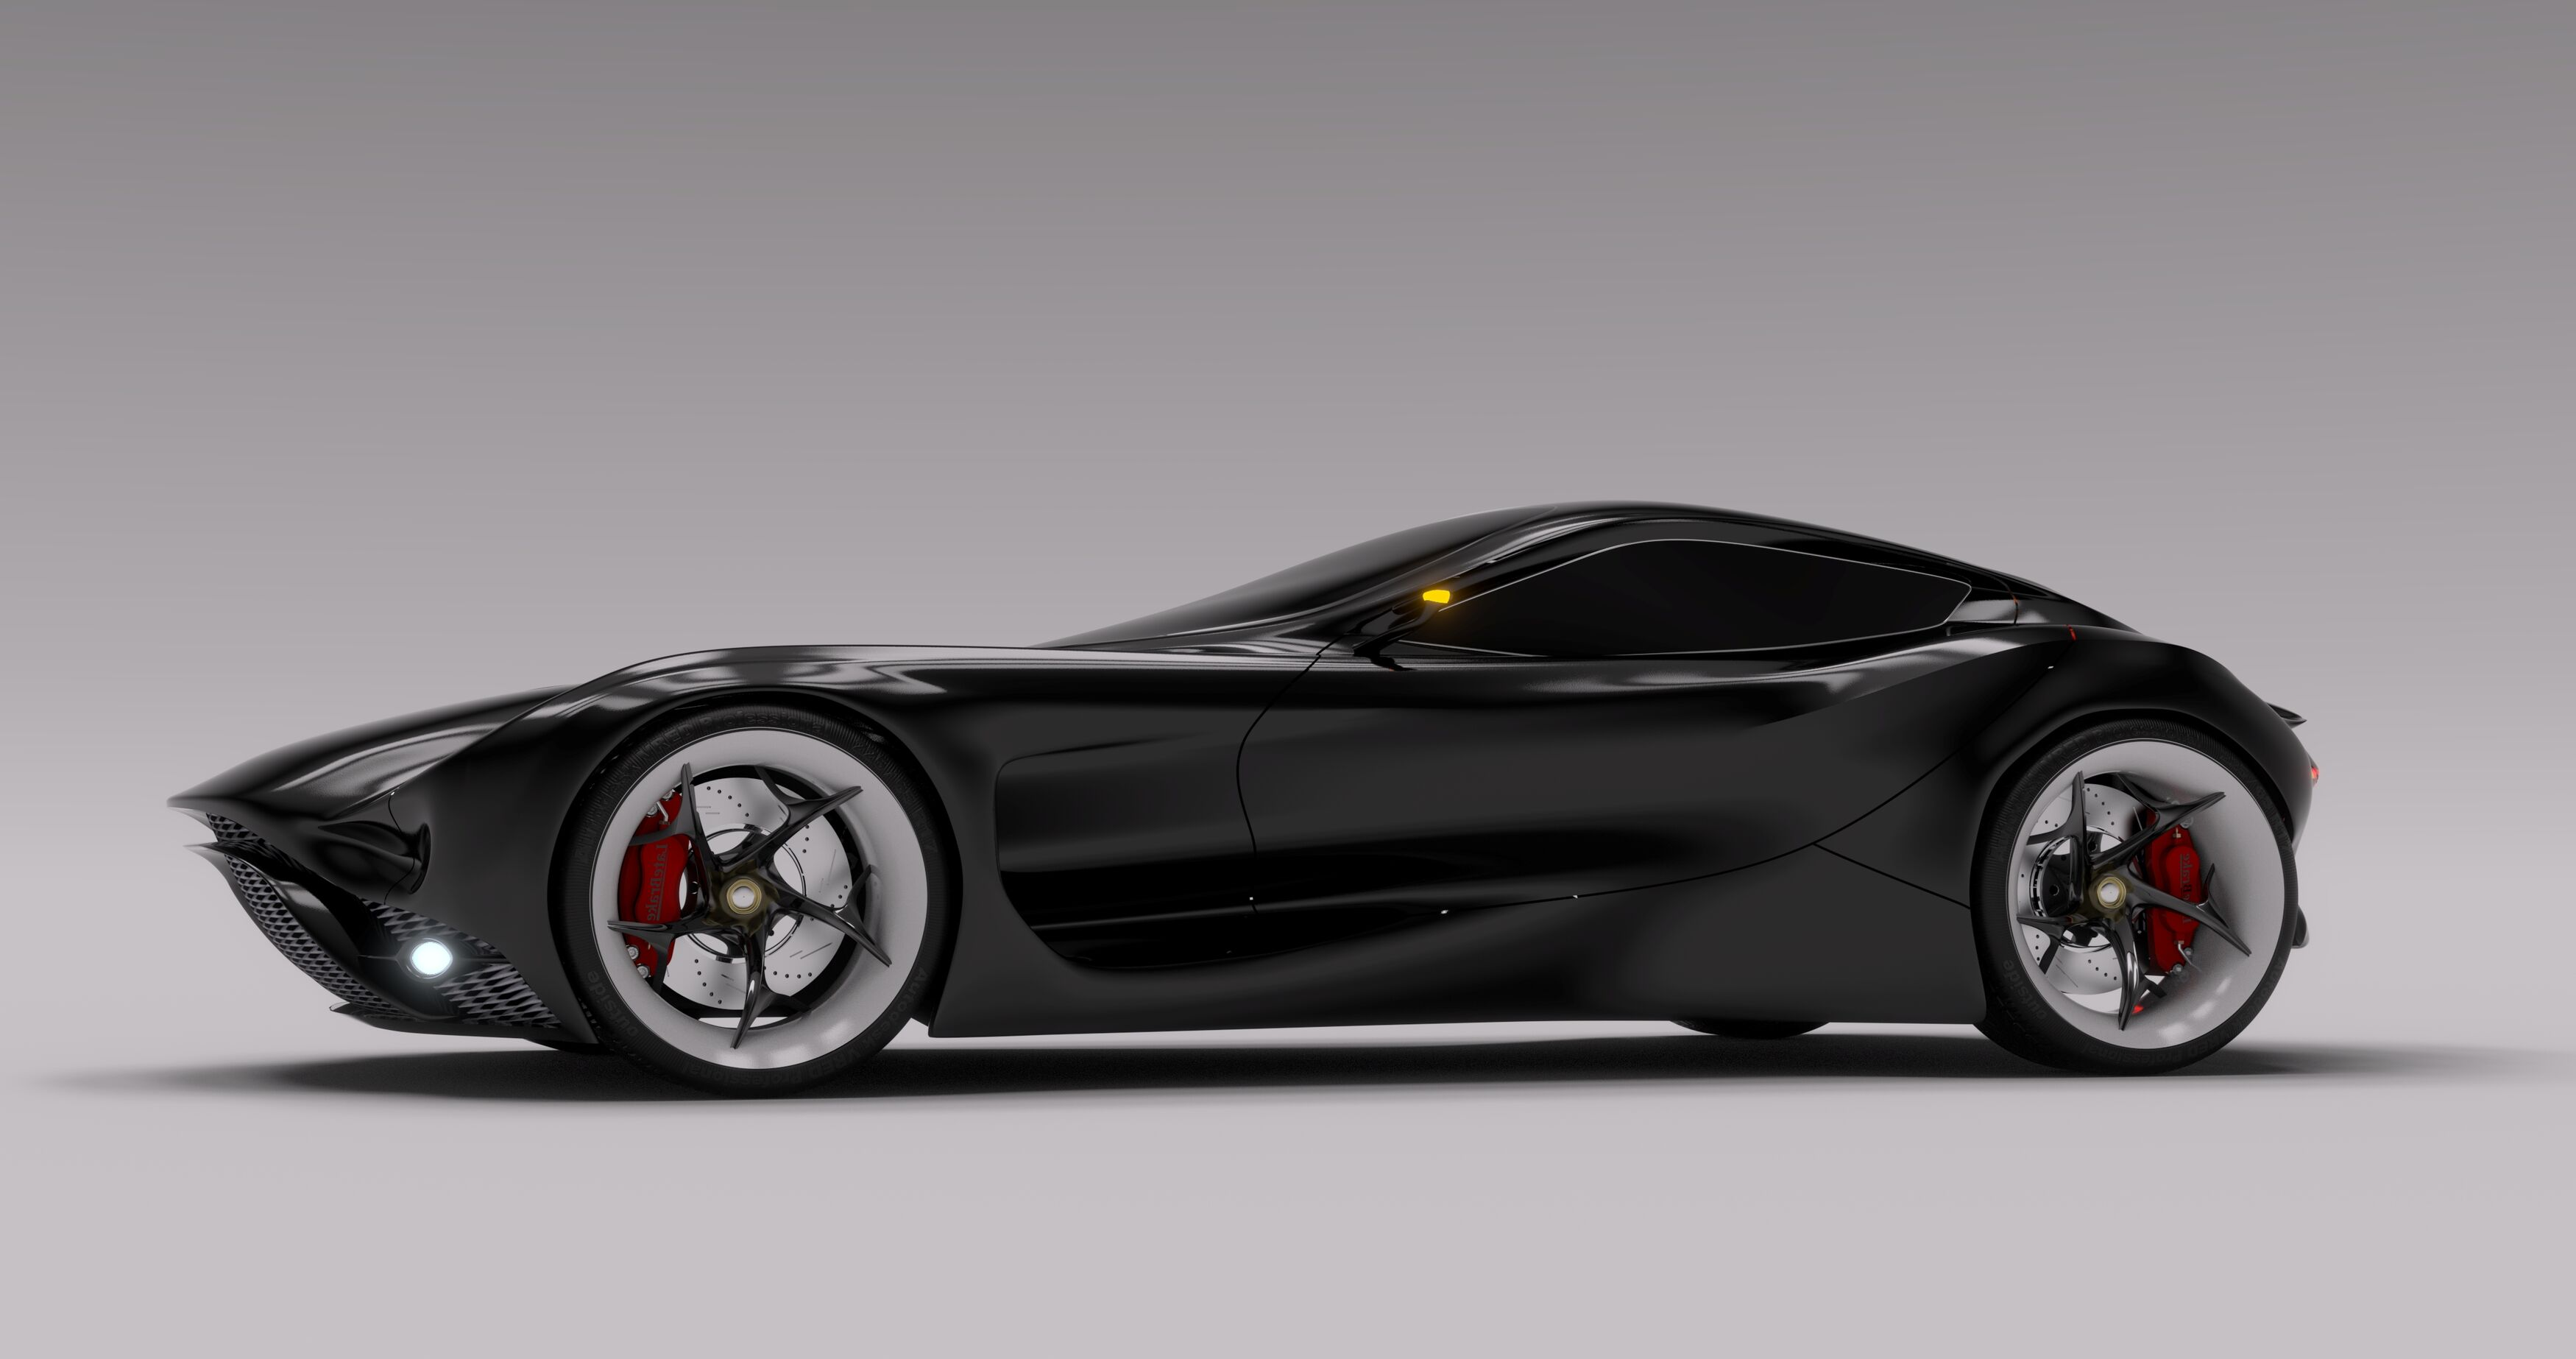 Aston-martin-db-zagato-x-5-3500-3500